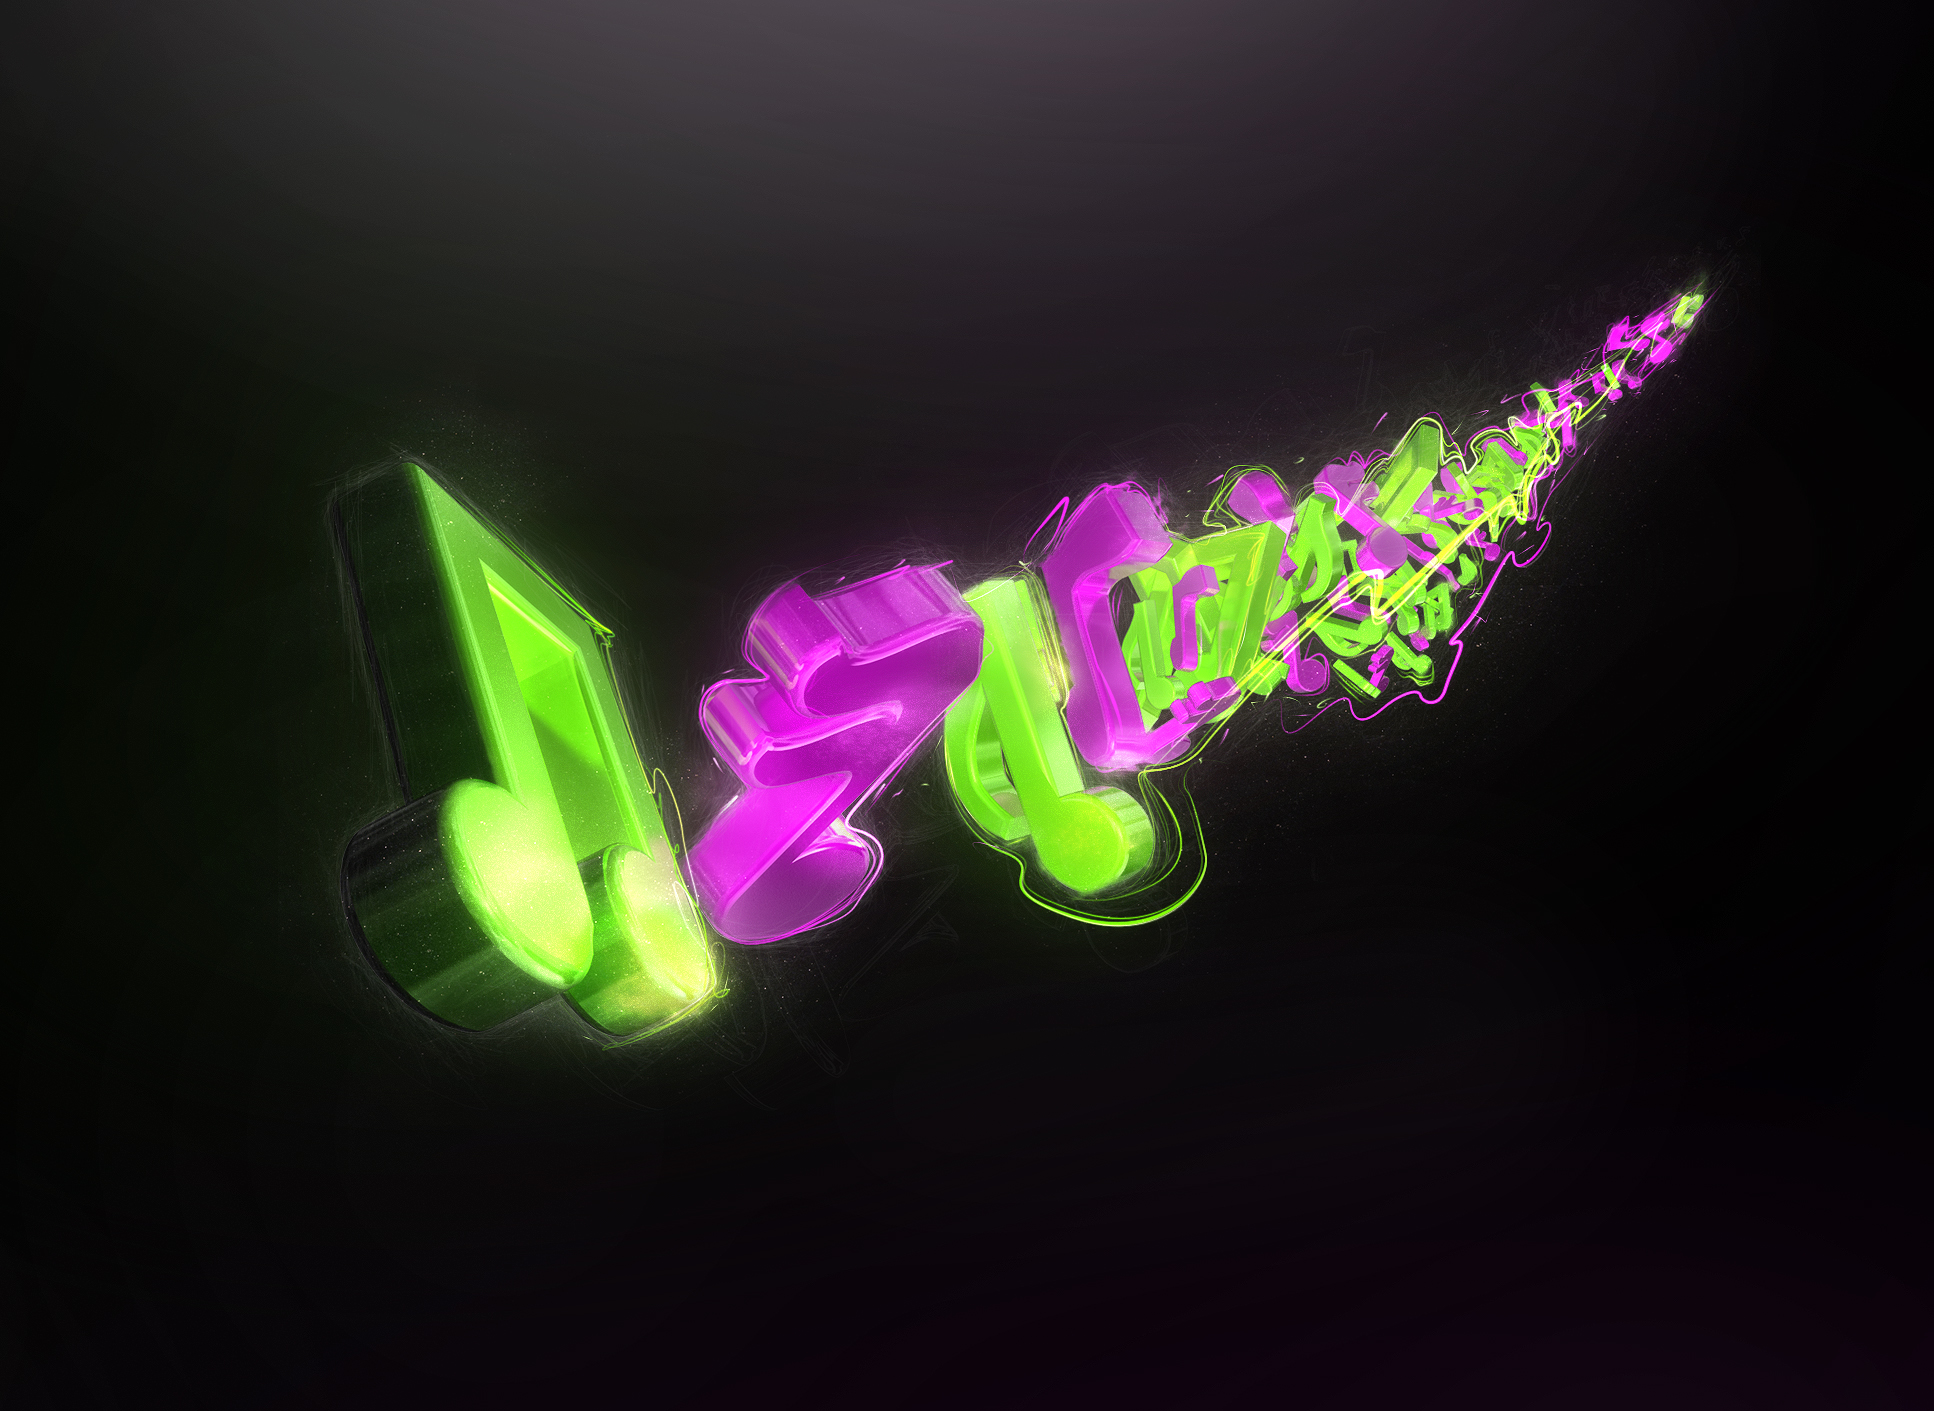 animasi-bergerak-not-musik-0043